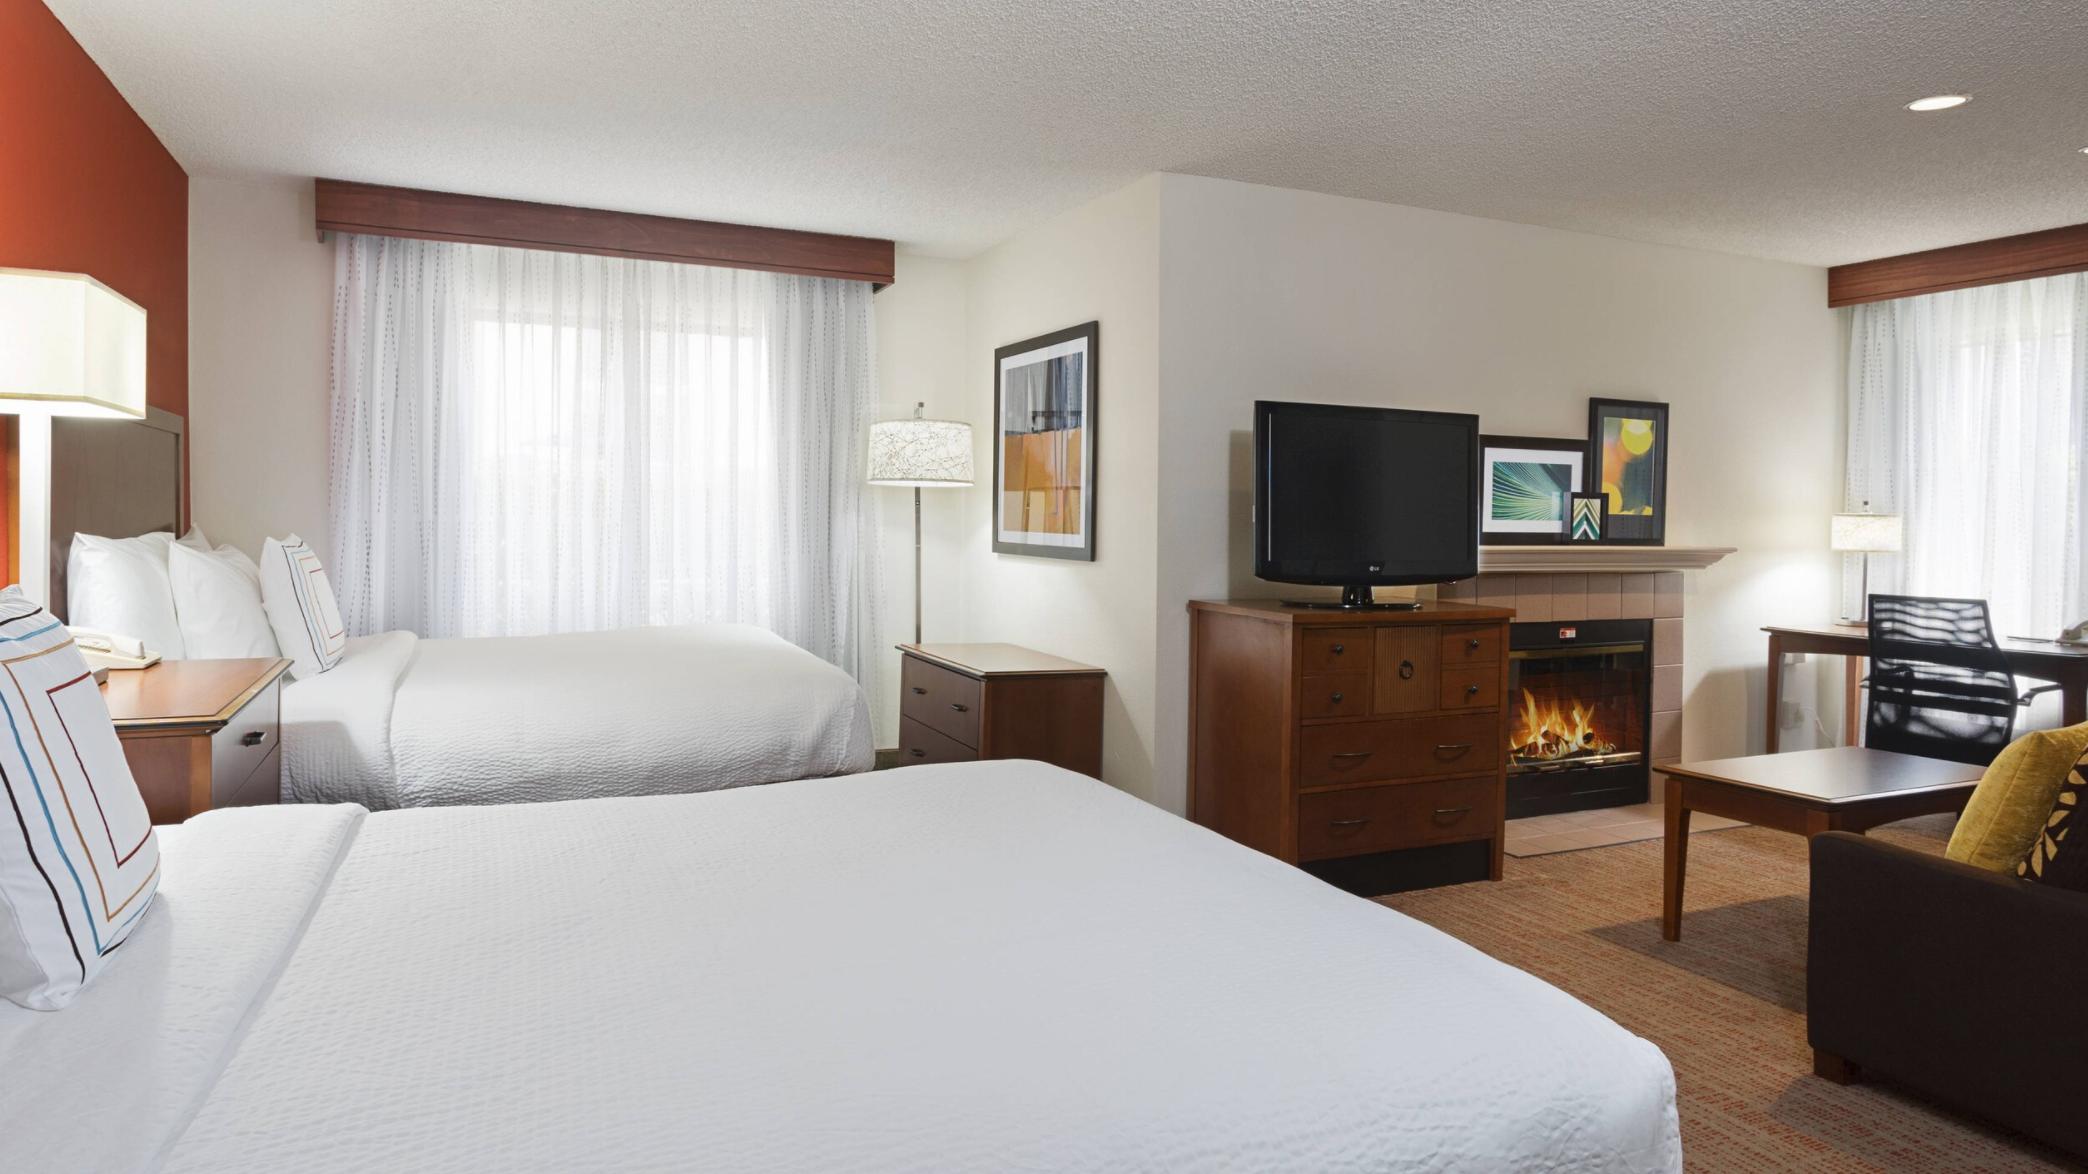 https://www.hotelsbyday.com/_data/default-hotel_image/4/21079/screenshot-2020-08-19-at-6-49-18-pm.png